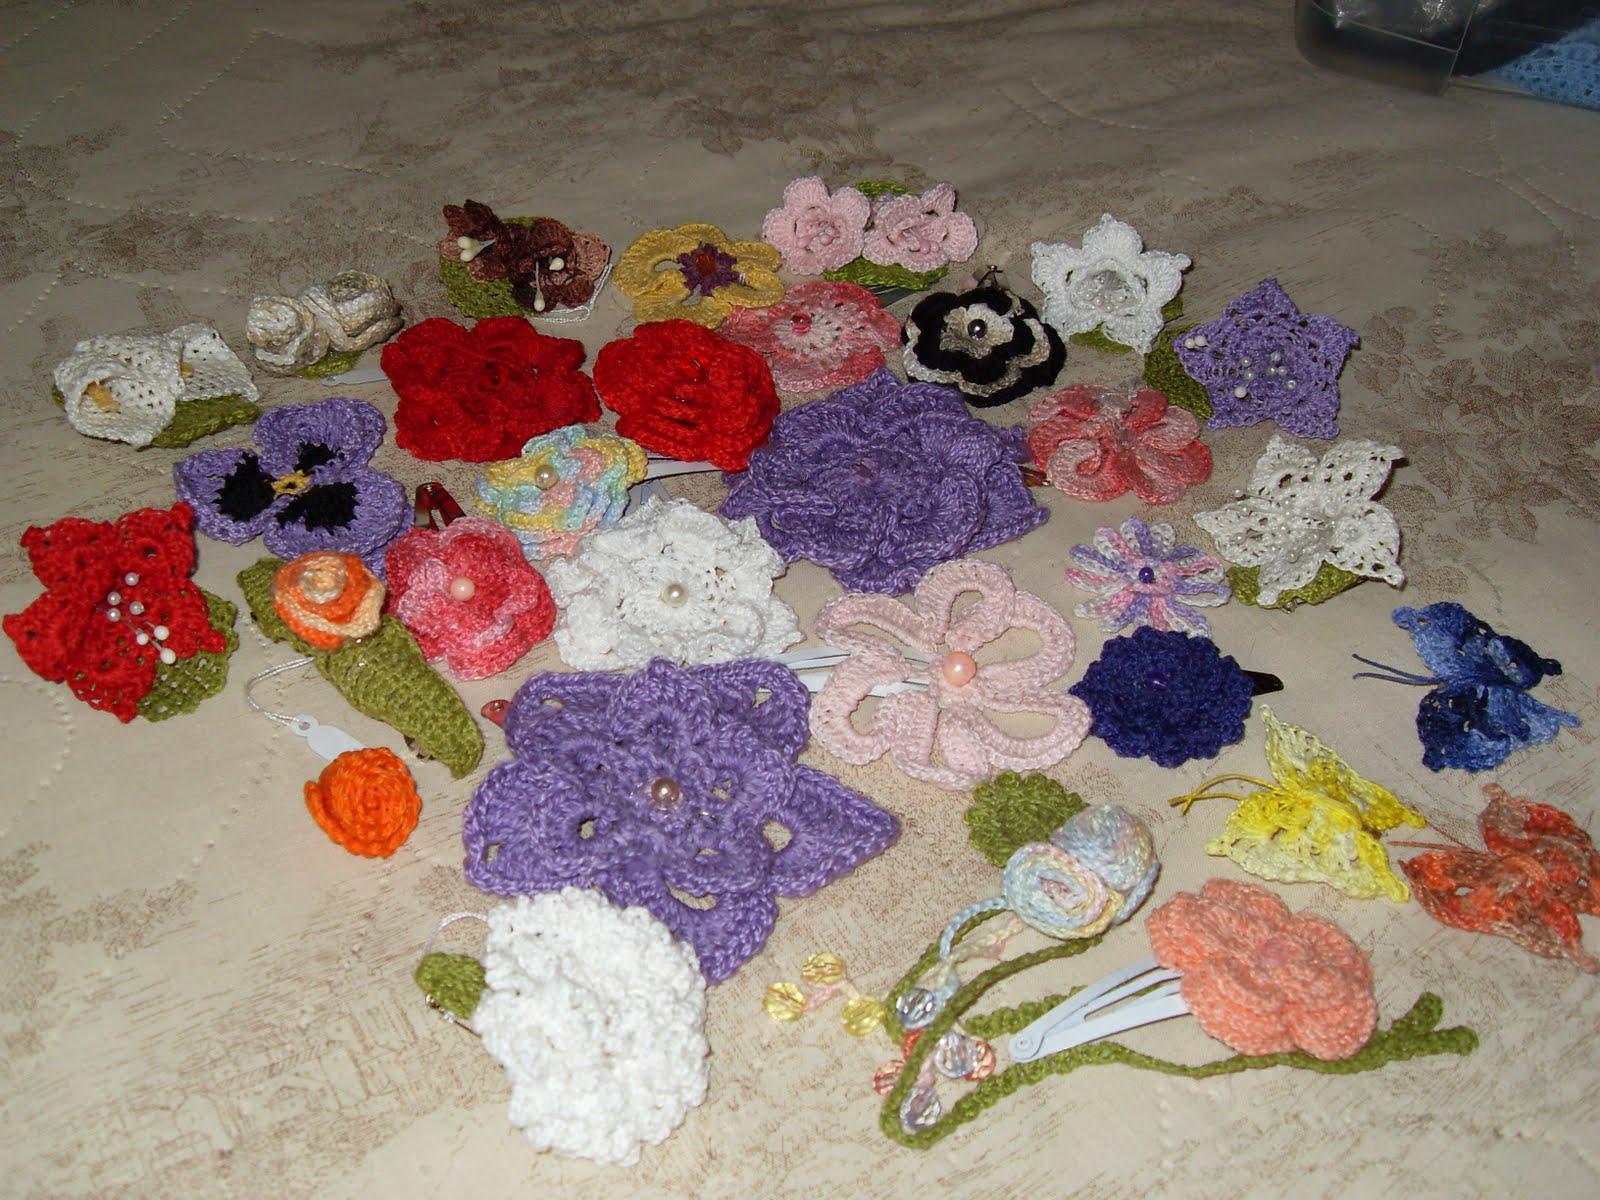 Meu jardim de crochê Flores de croche